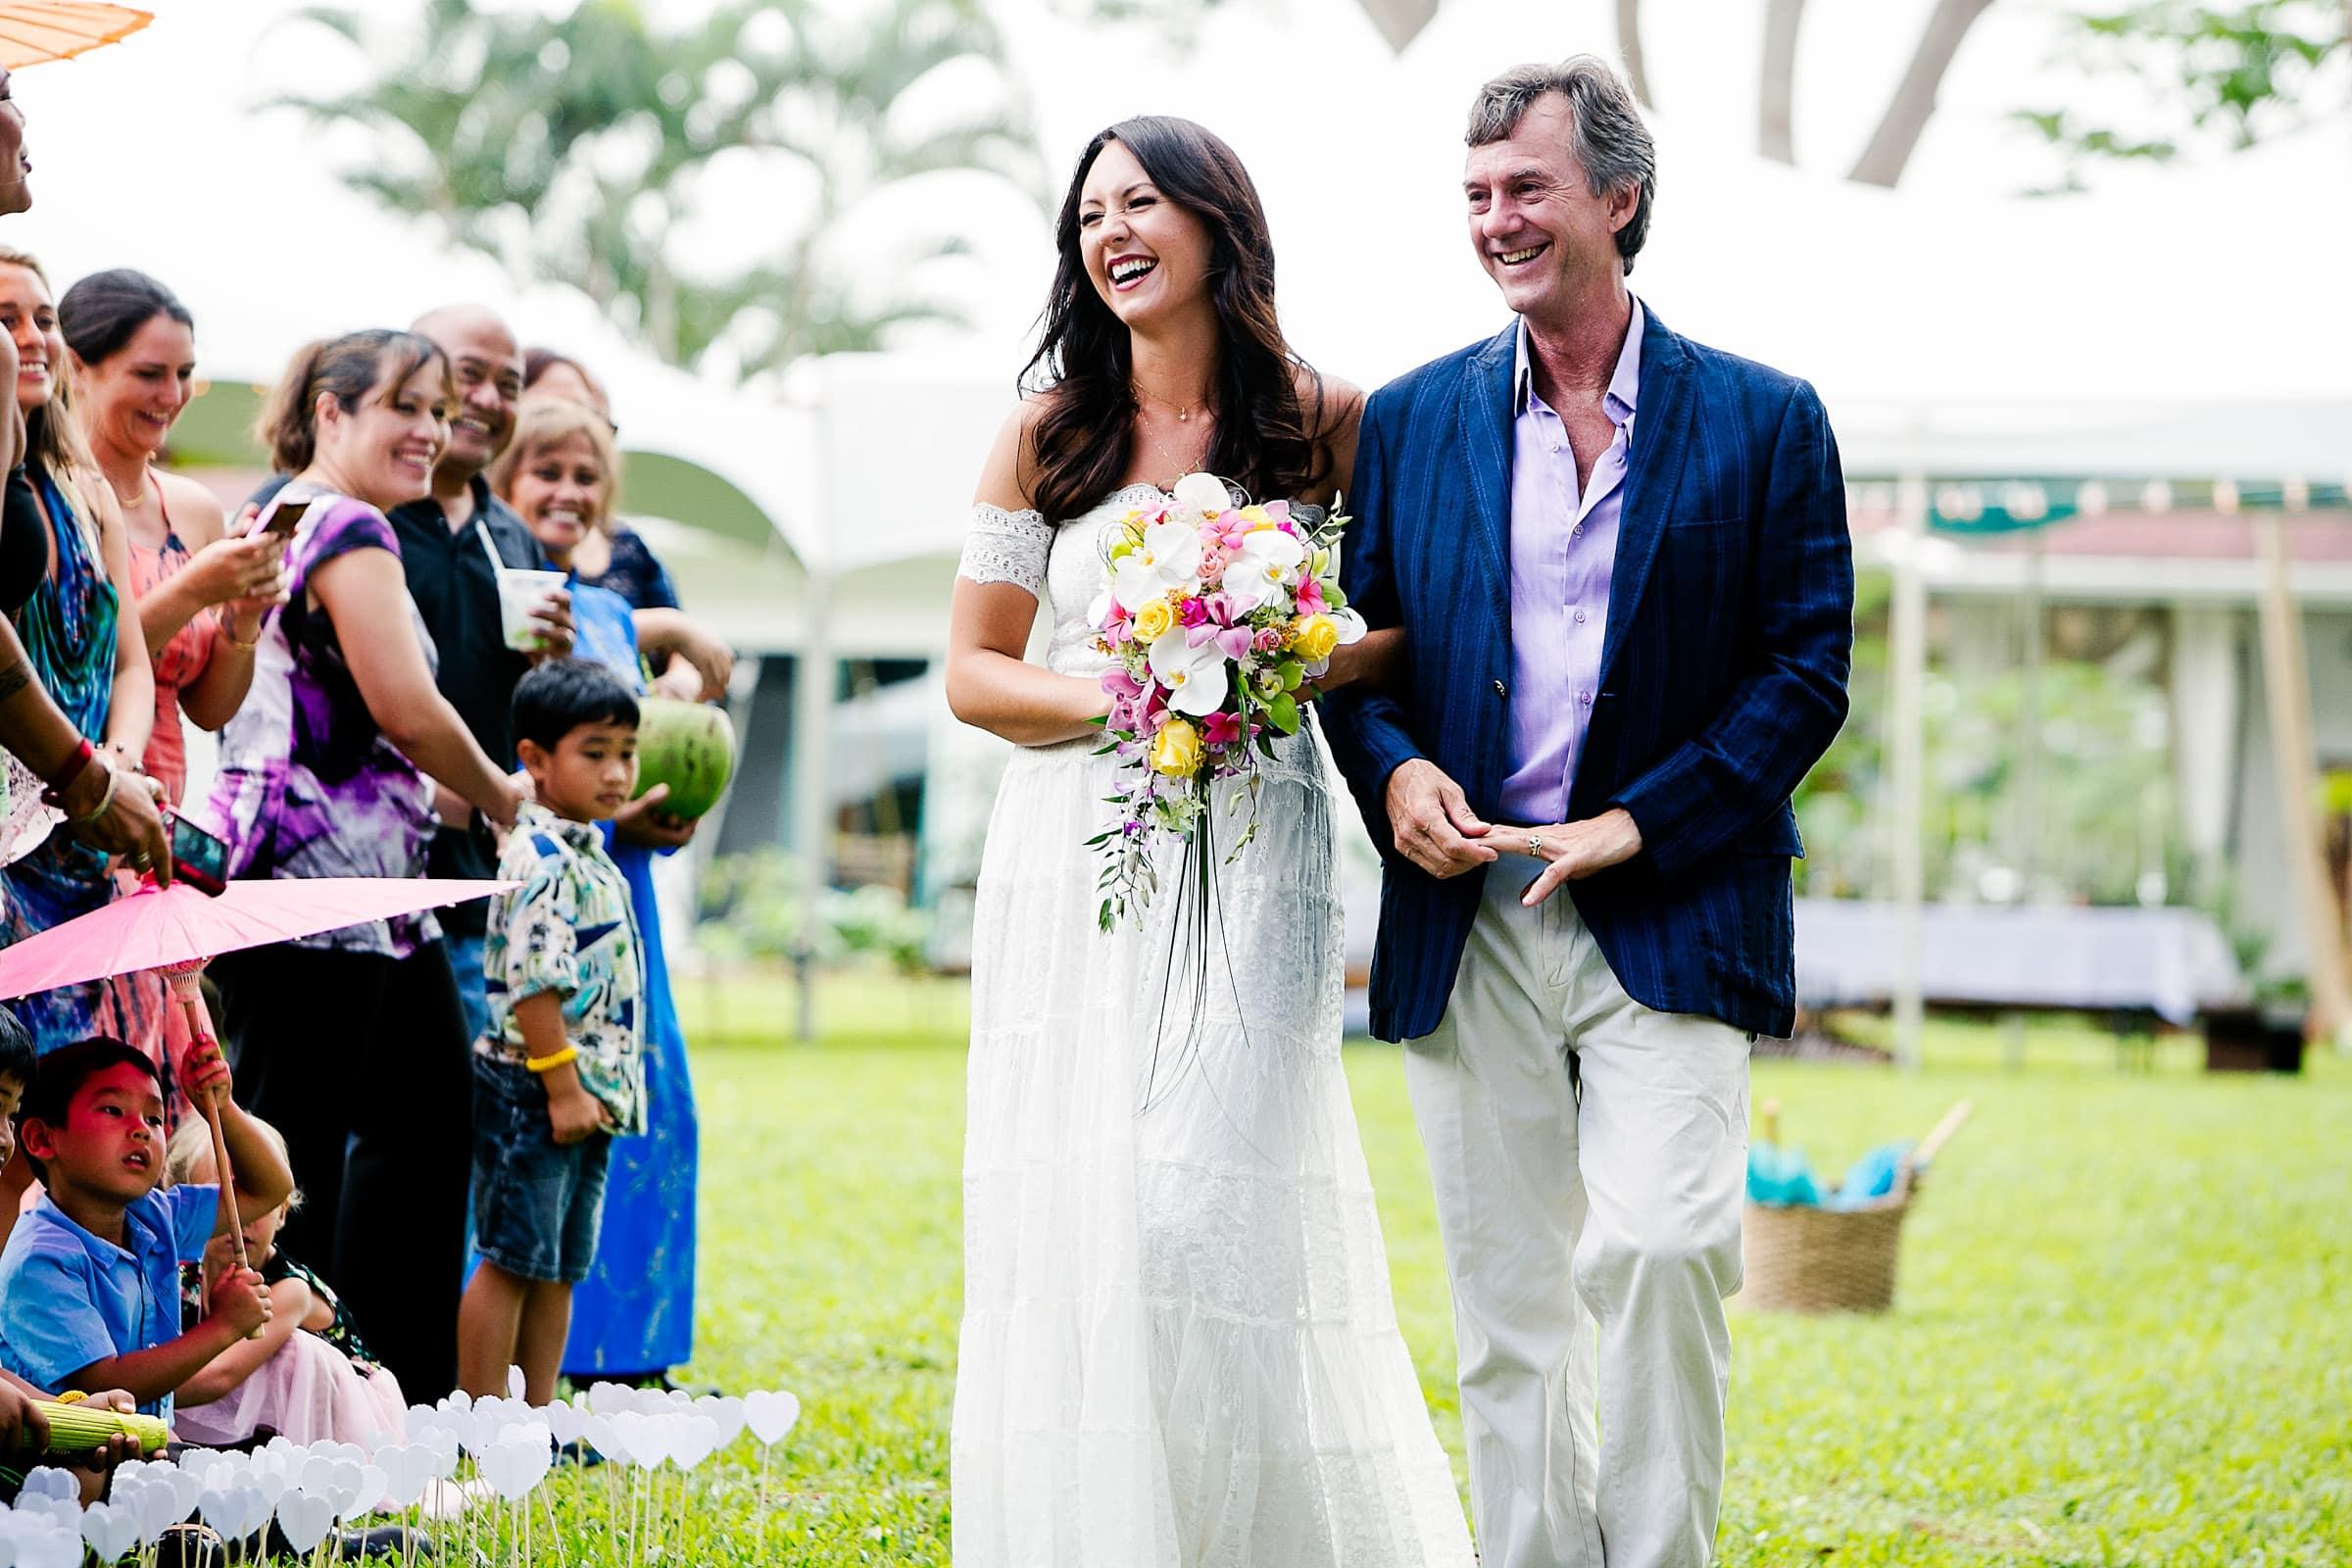 A happy bride walking into her Kauai Island wedding ceremony amidst massive majestic acacias trees on a private estate